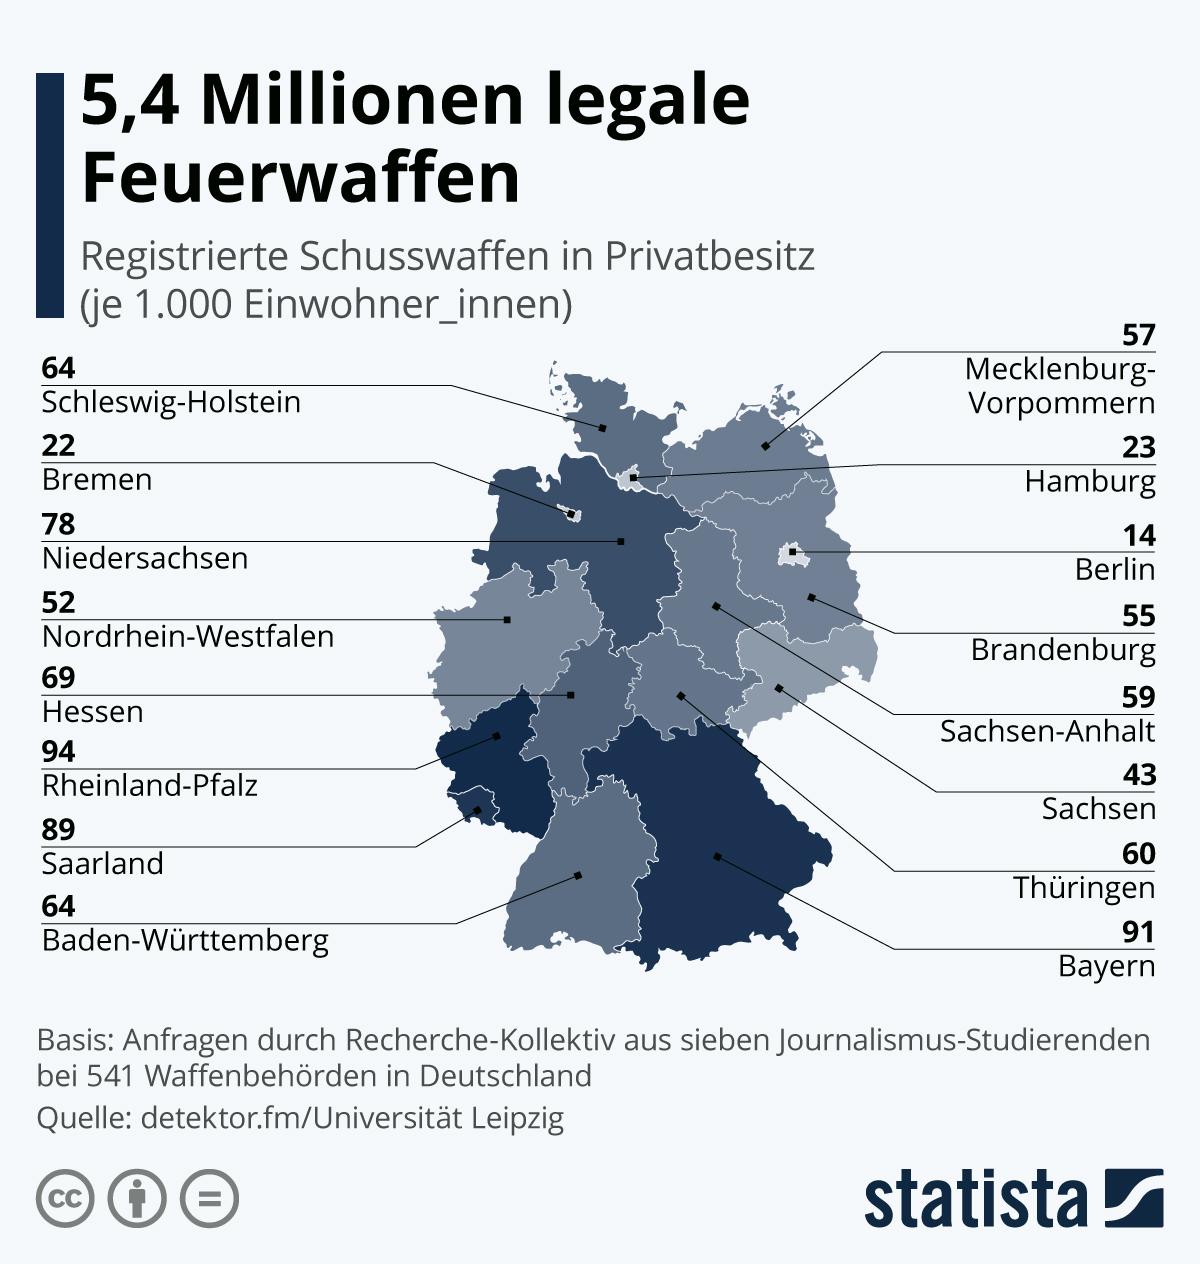 Infografik: 5,4 Millionen legale Feuerwaffen | Statista